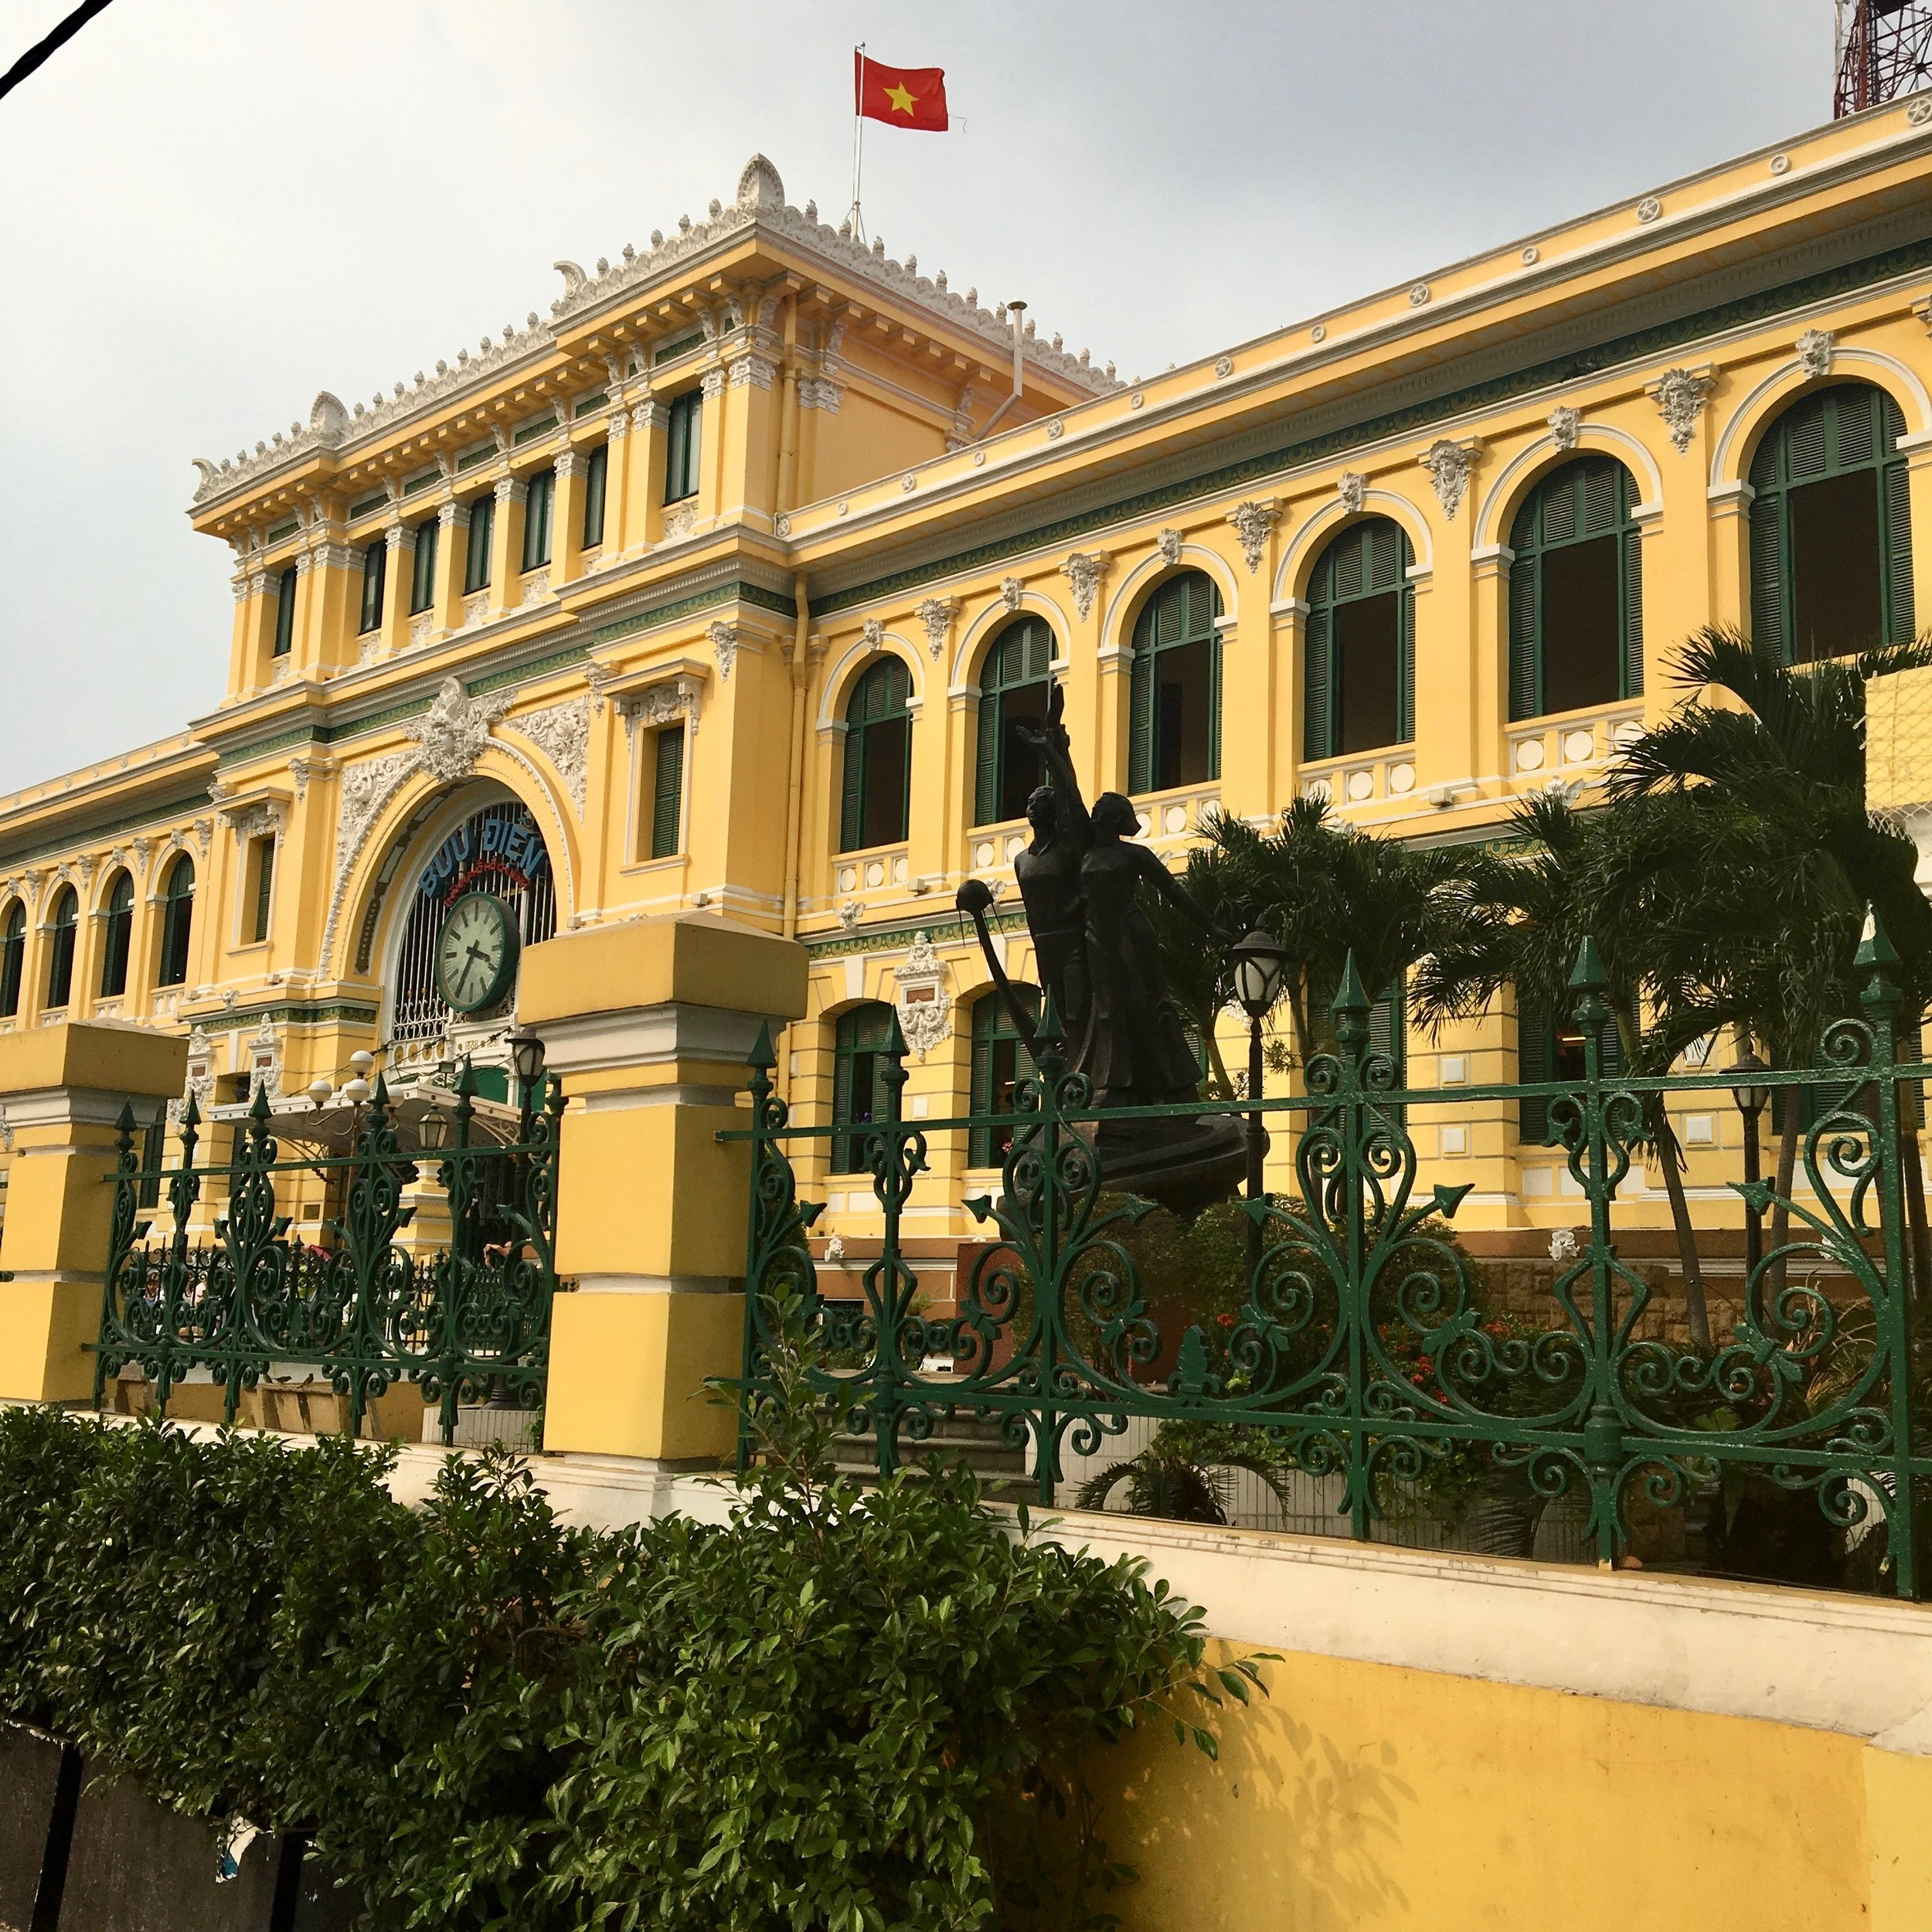 Saigon Central Post Office / Ho Chi Minh City / ©2017 Melody Jean Moulton